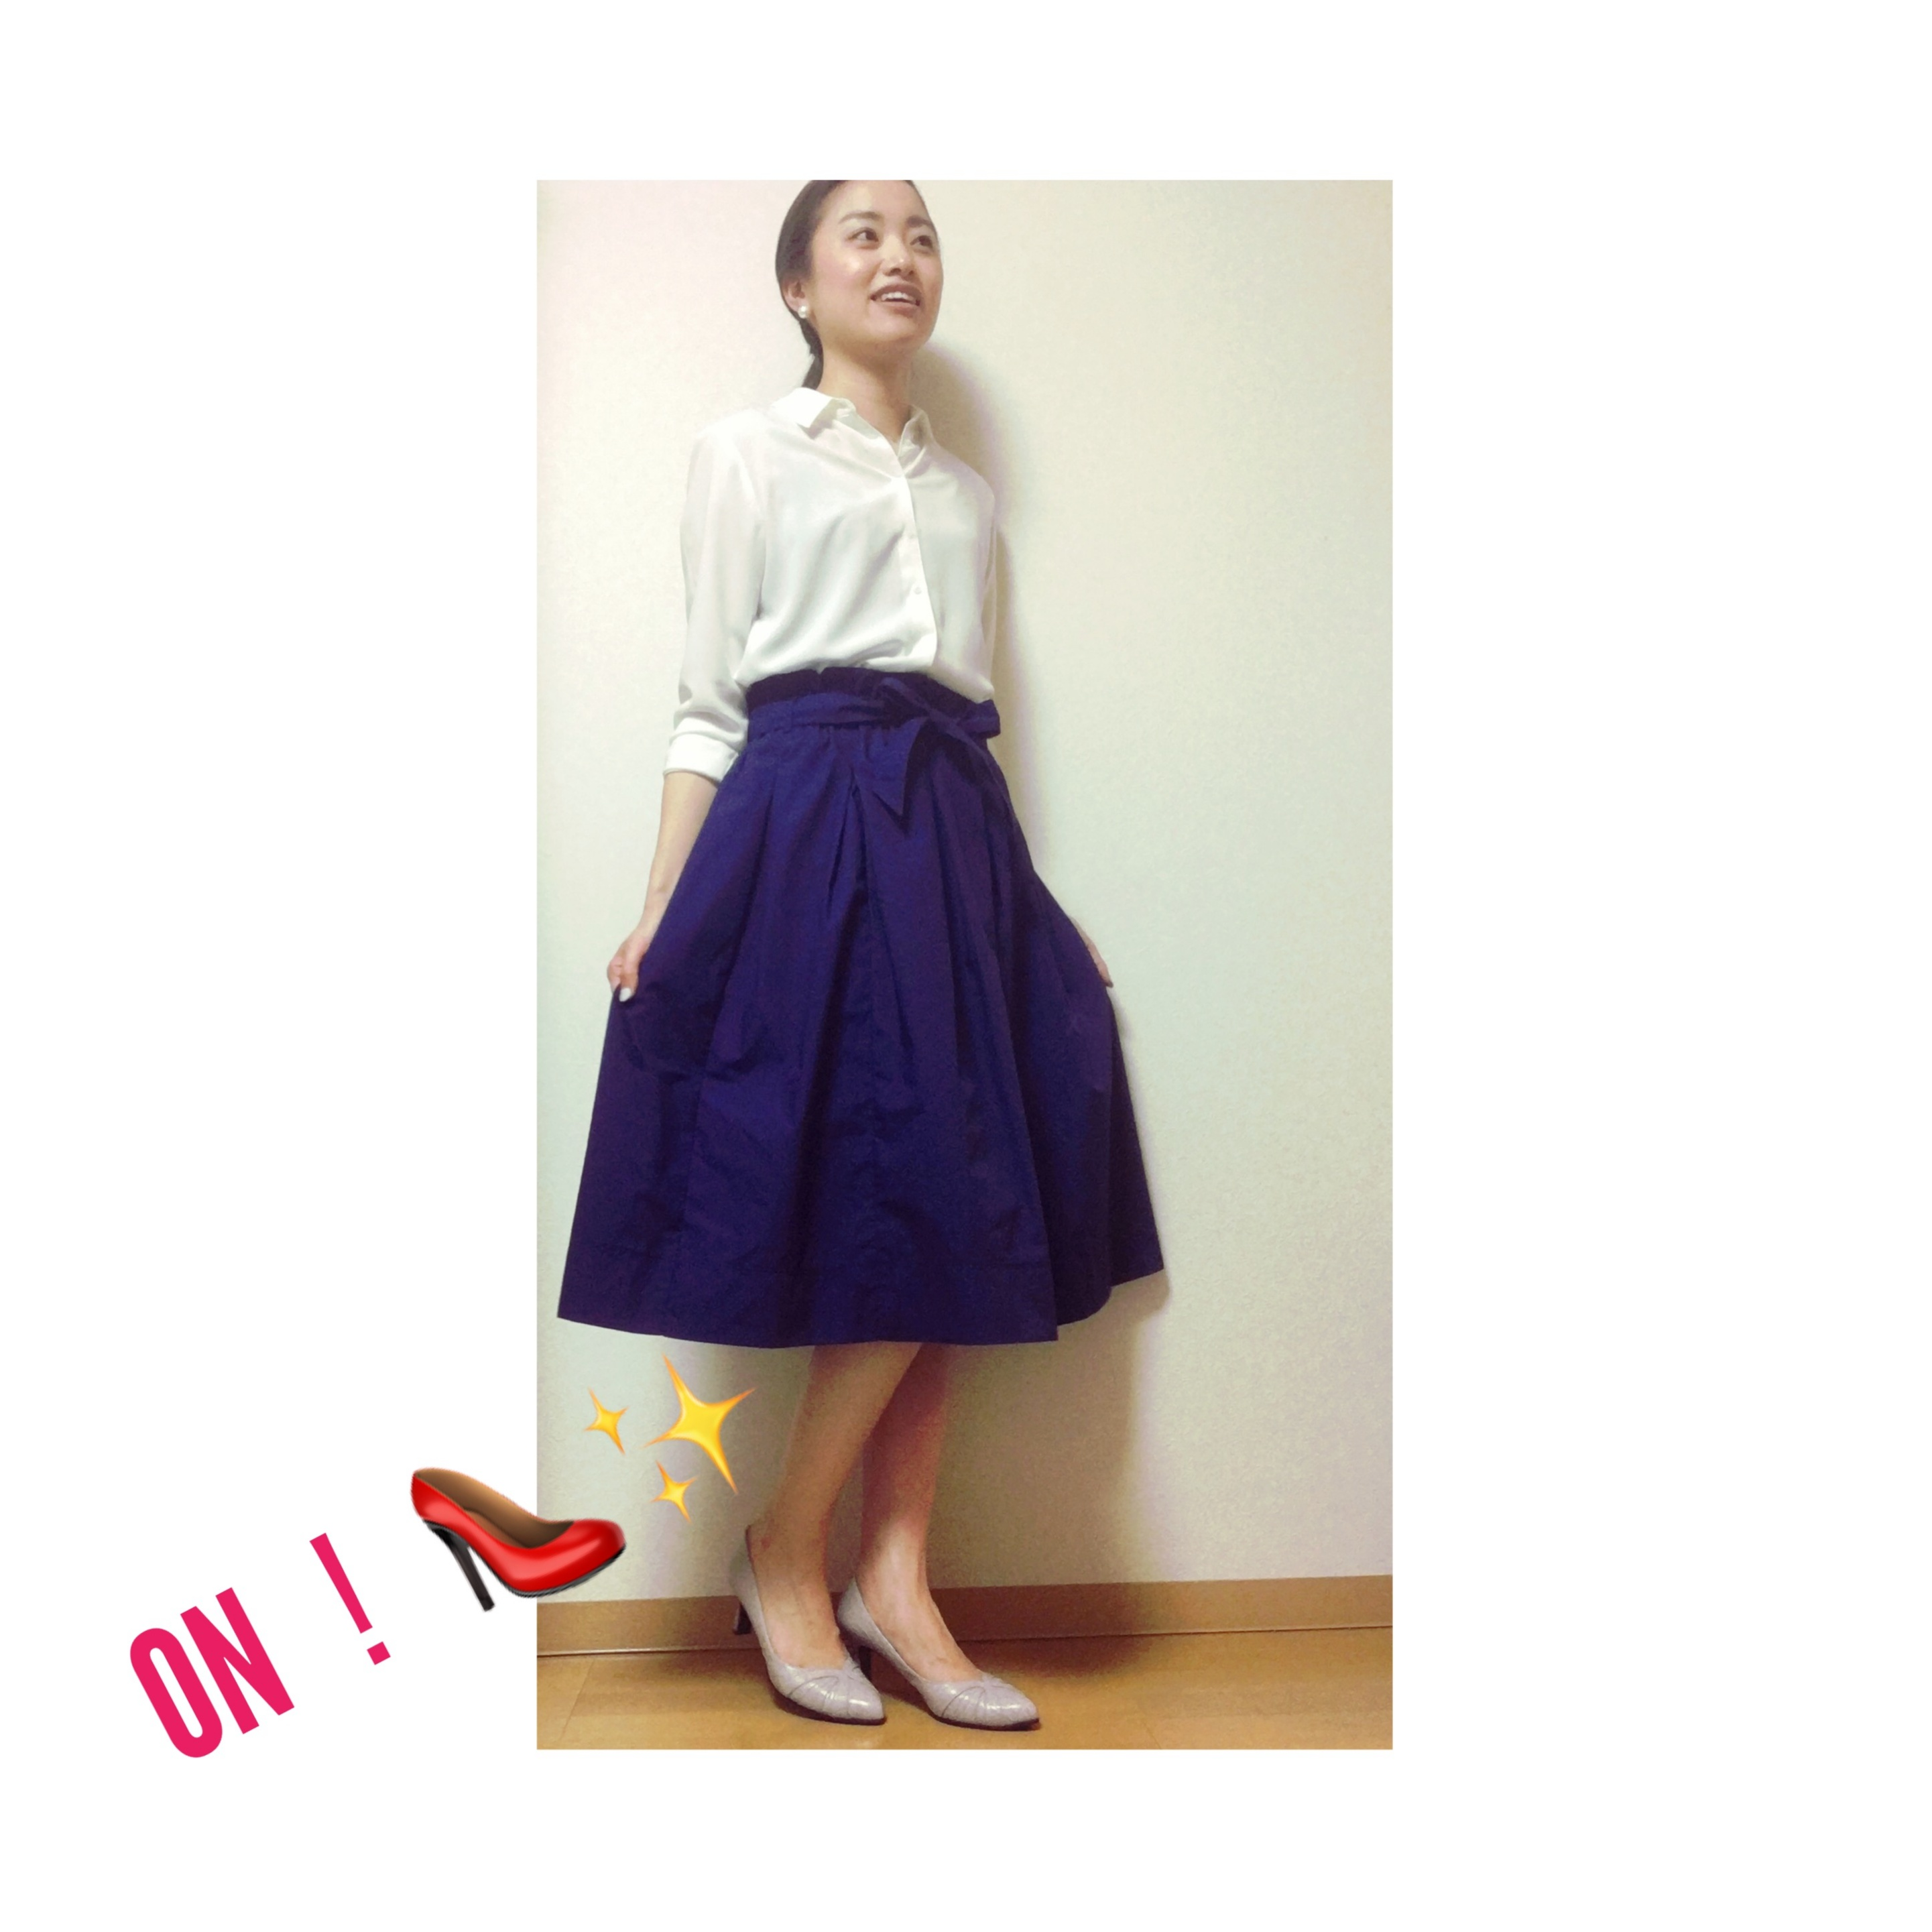 【UNIQLO】夏に向けていま買い足したい❤︎!ハイウエストベルテッドフレアミディスカート✨_2